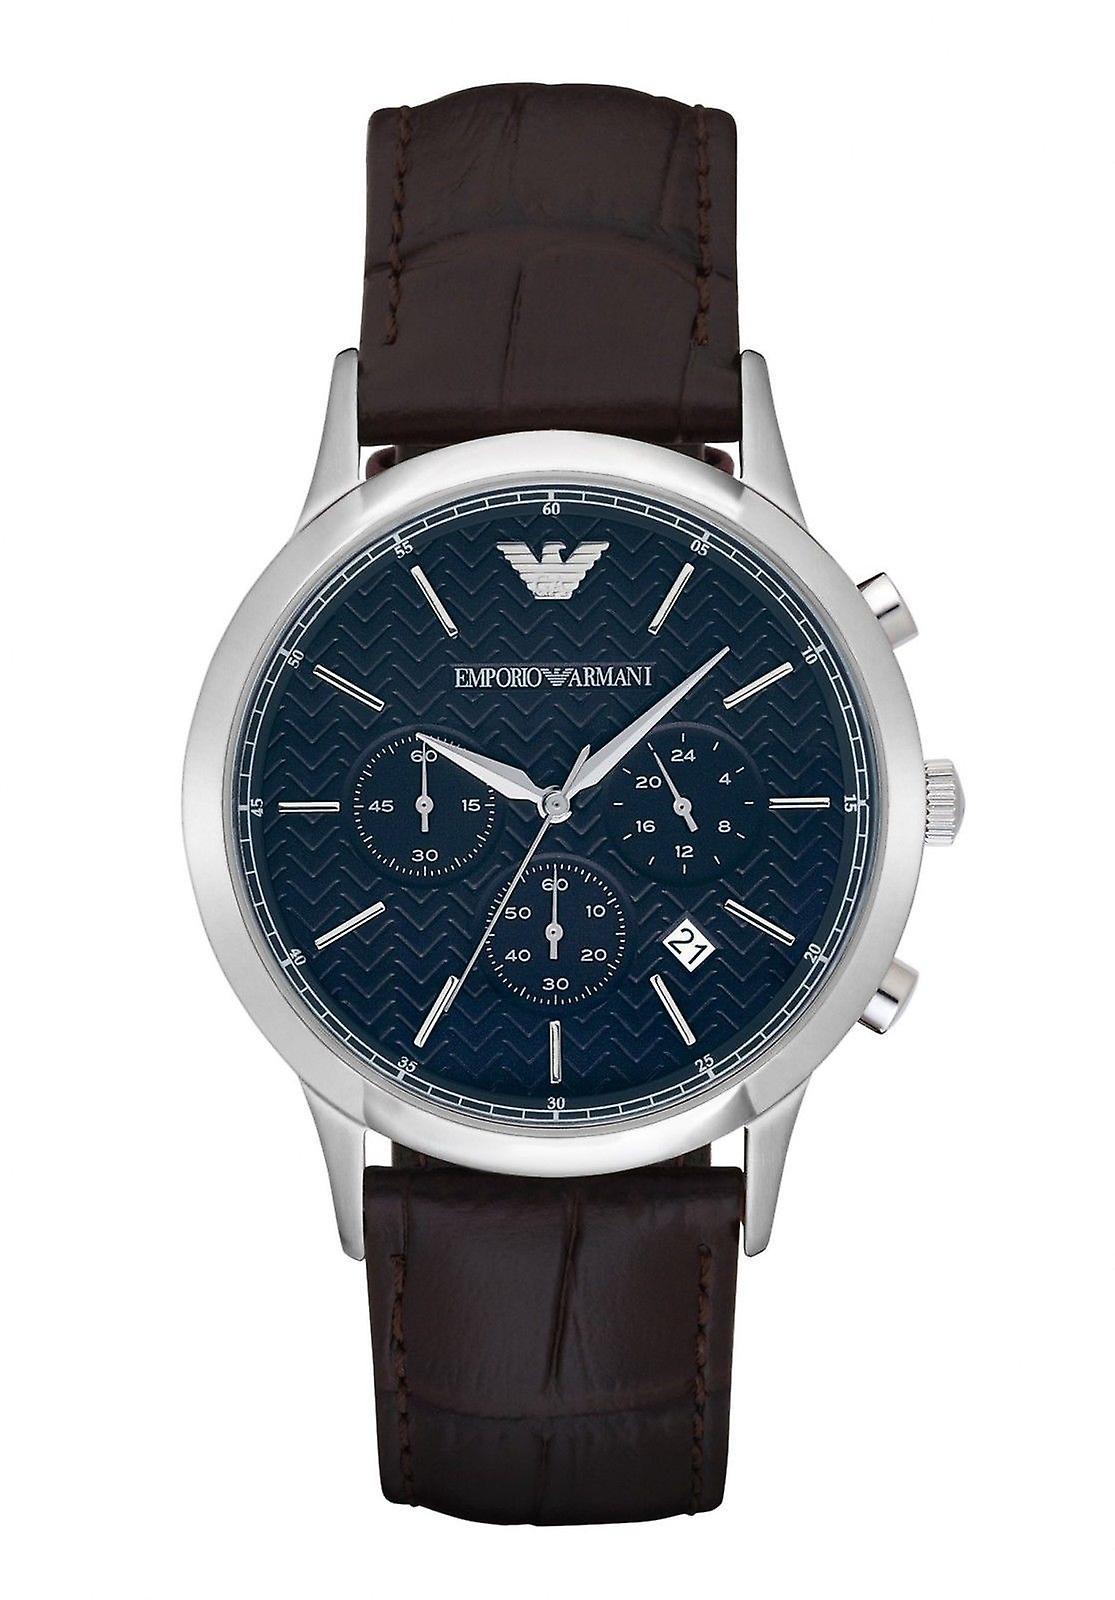 Emporio Armani Ar2494 Men's Wrist Watch